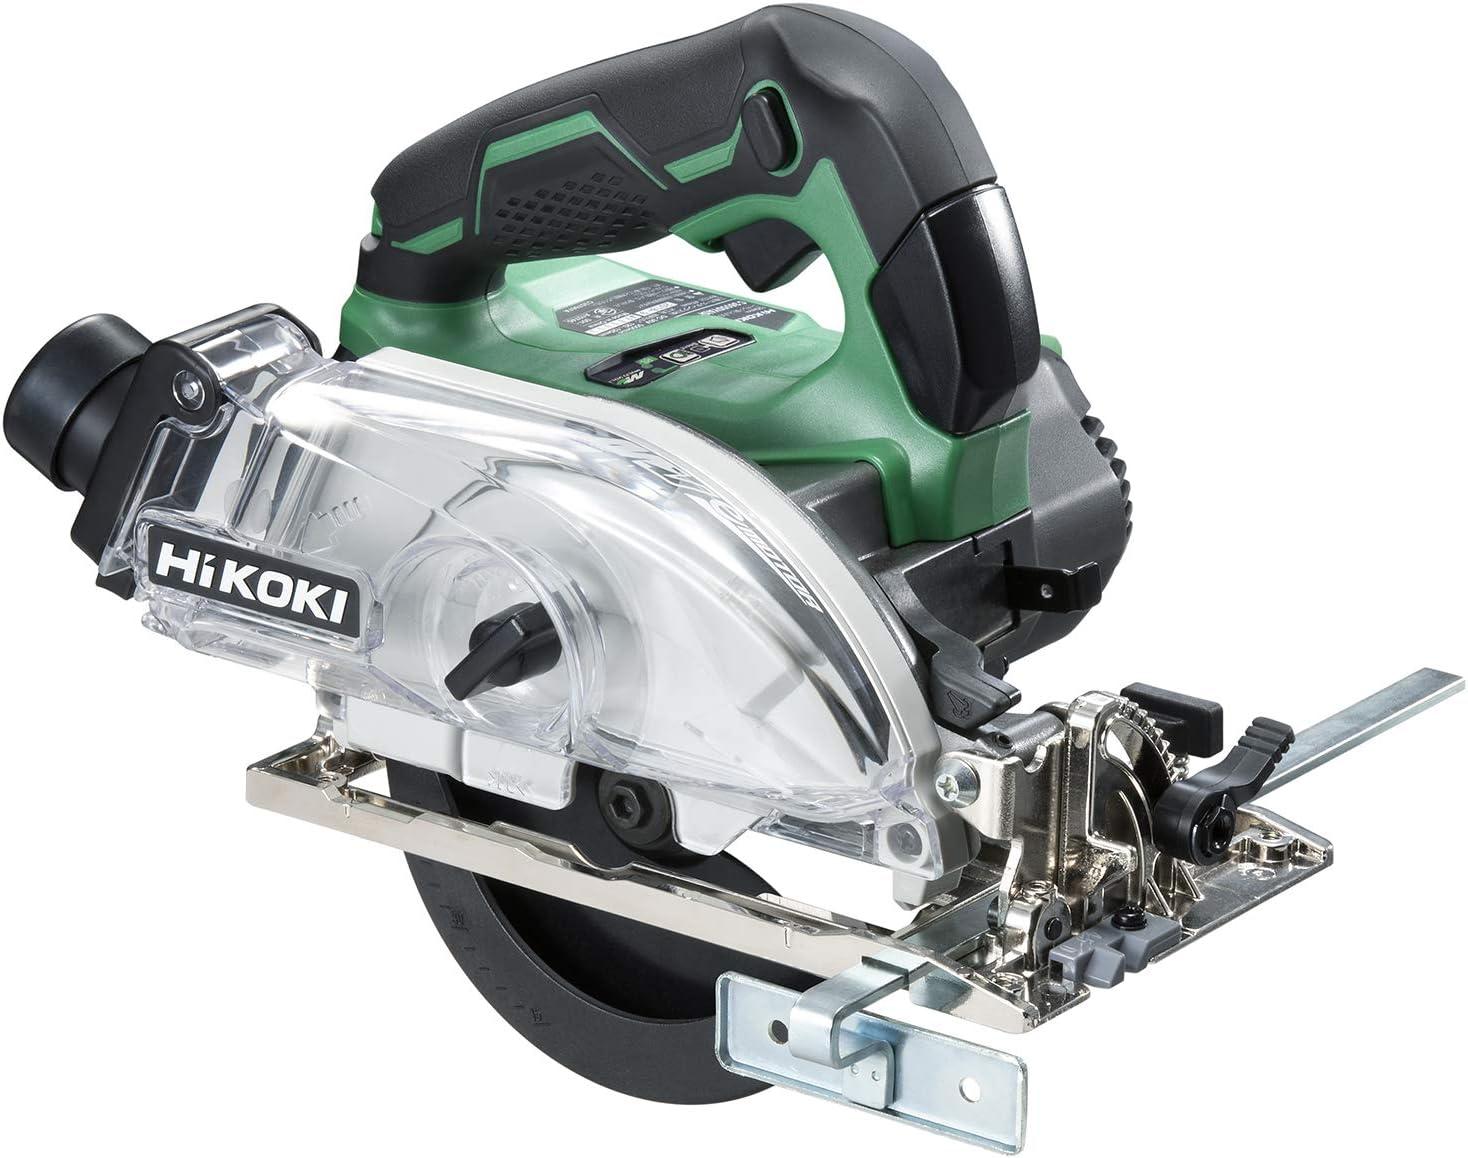 HiKOKI(ハイコーキ) 旧日立工機 コードレス集塵丸ノコ マルチボルトシリーズ C3605DYA(XPS)